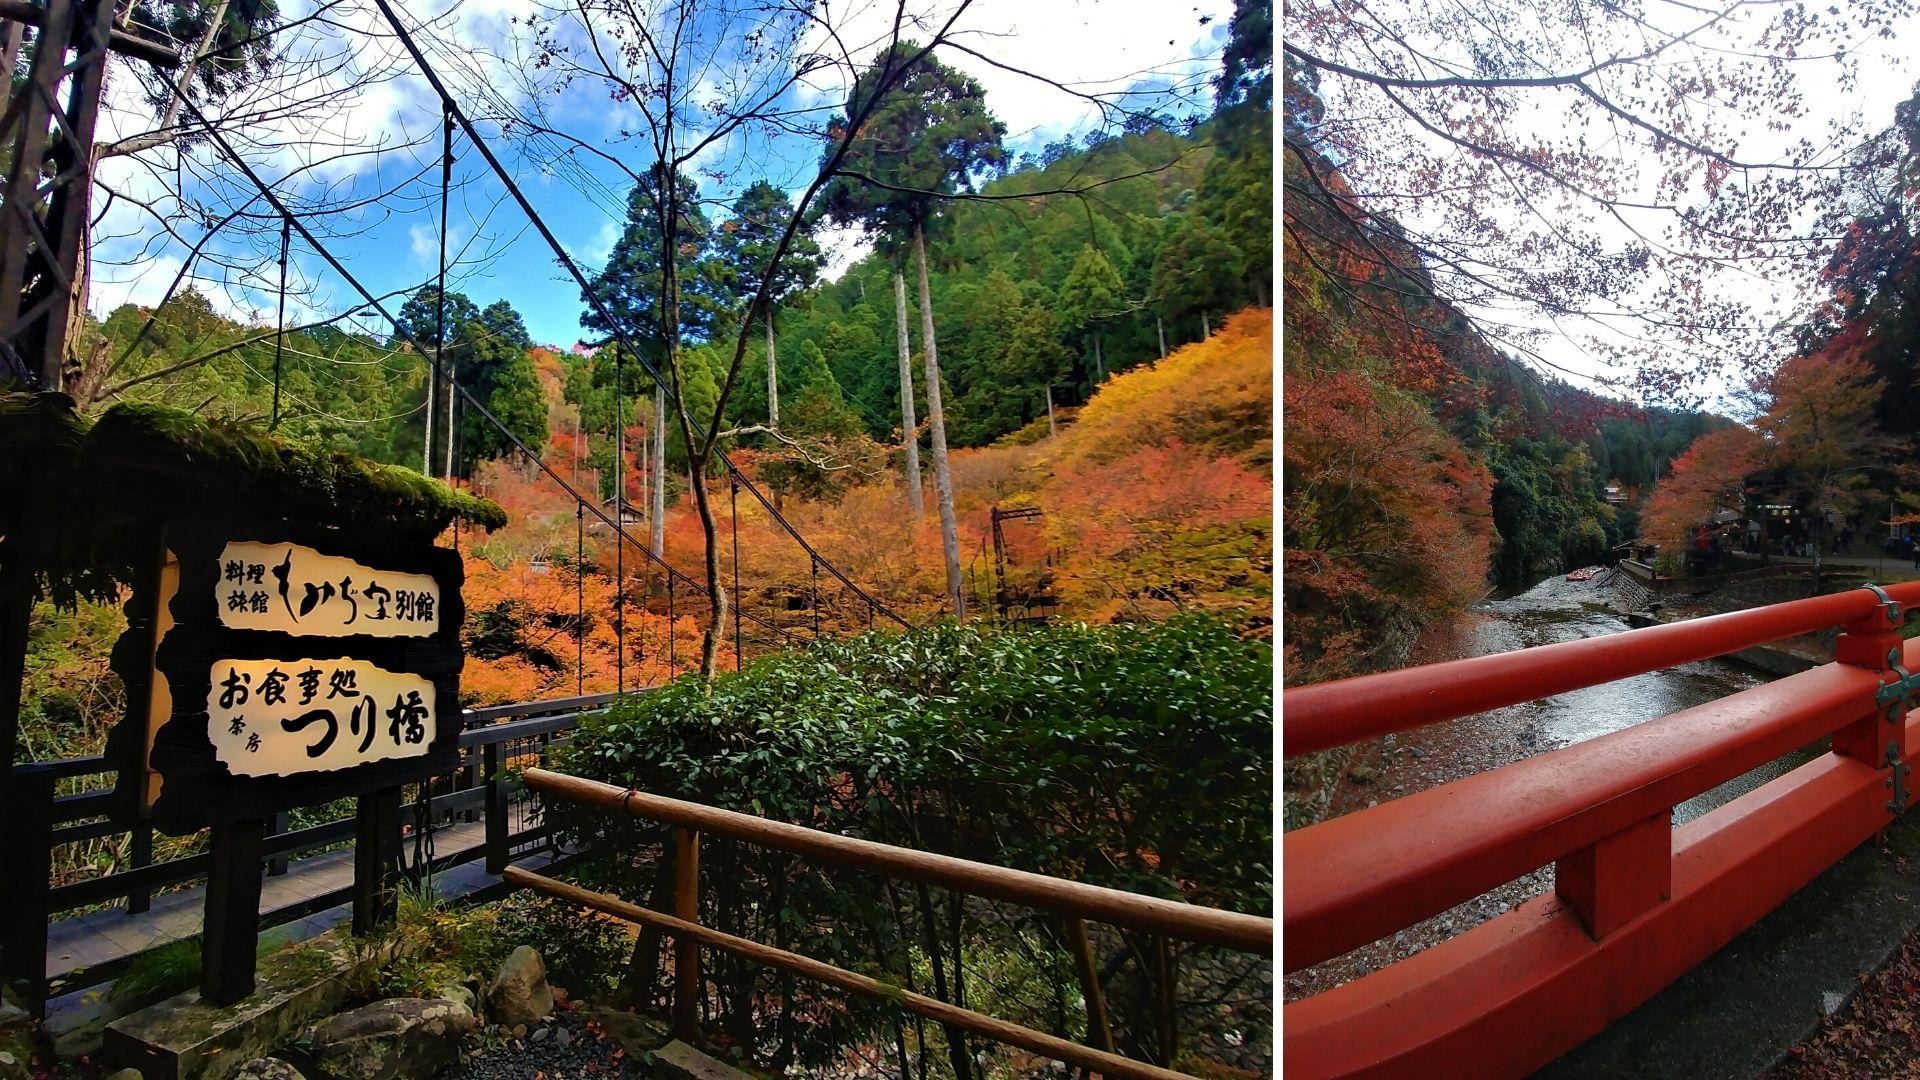 kyoto takao togano randonnee blog voyage japon arpenter le chemin